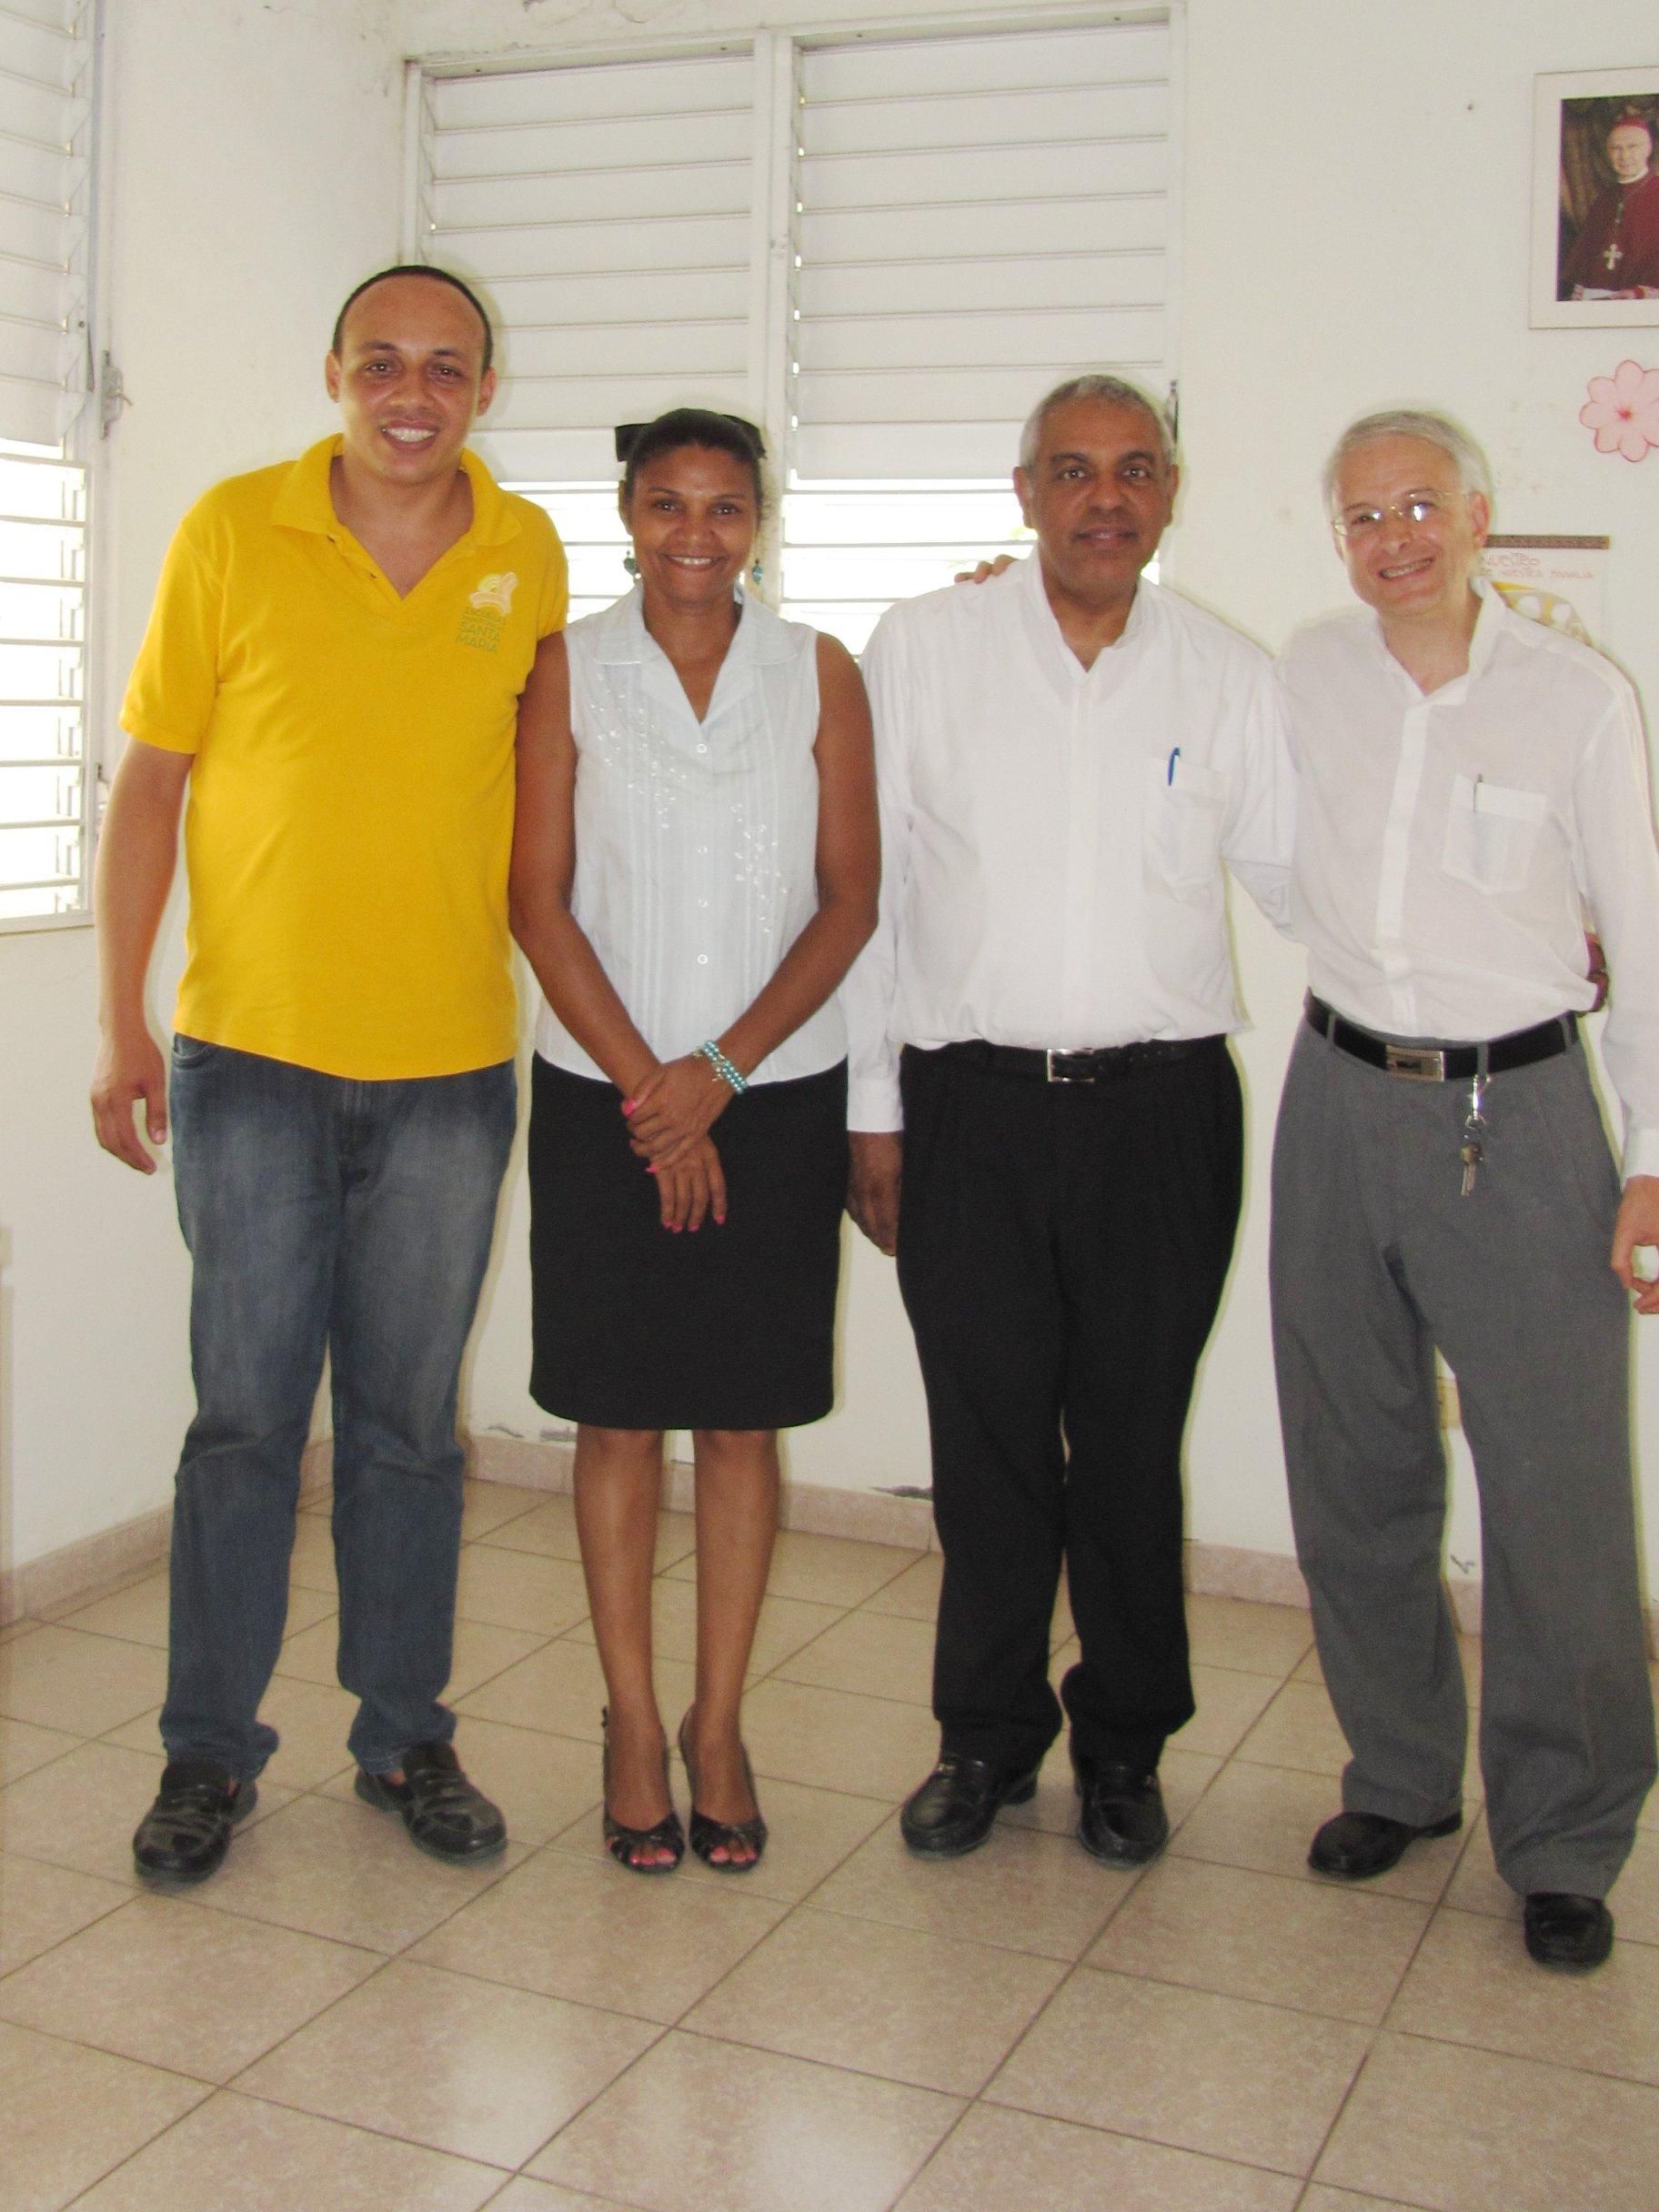 santo_domingo_almuerzo_con_padres_2012-06-28-13-25-13